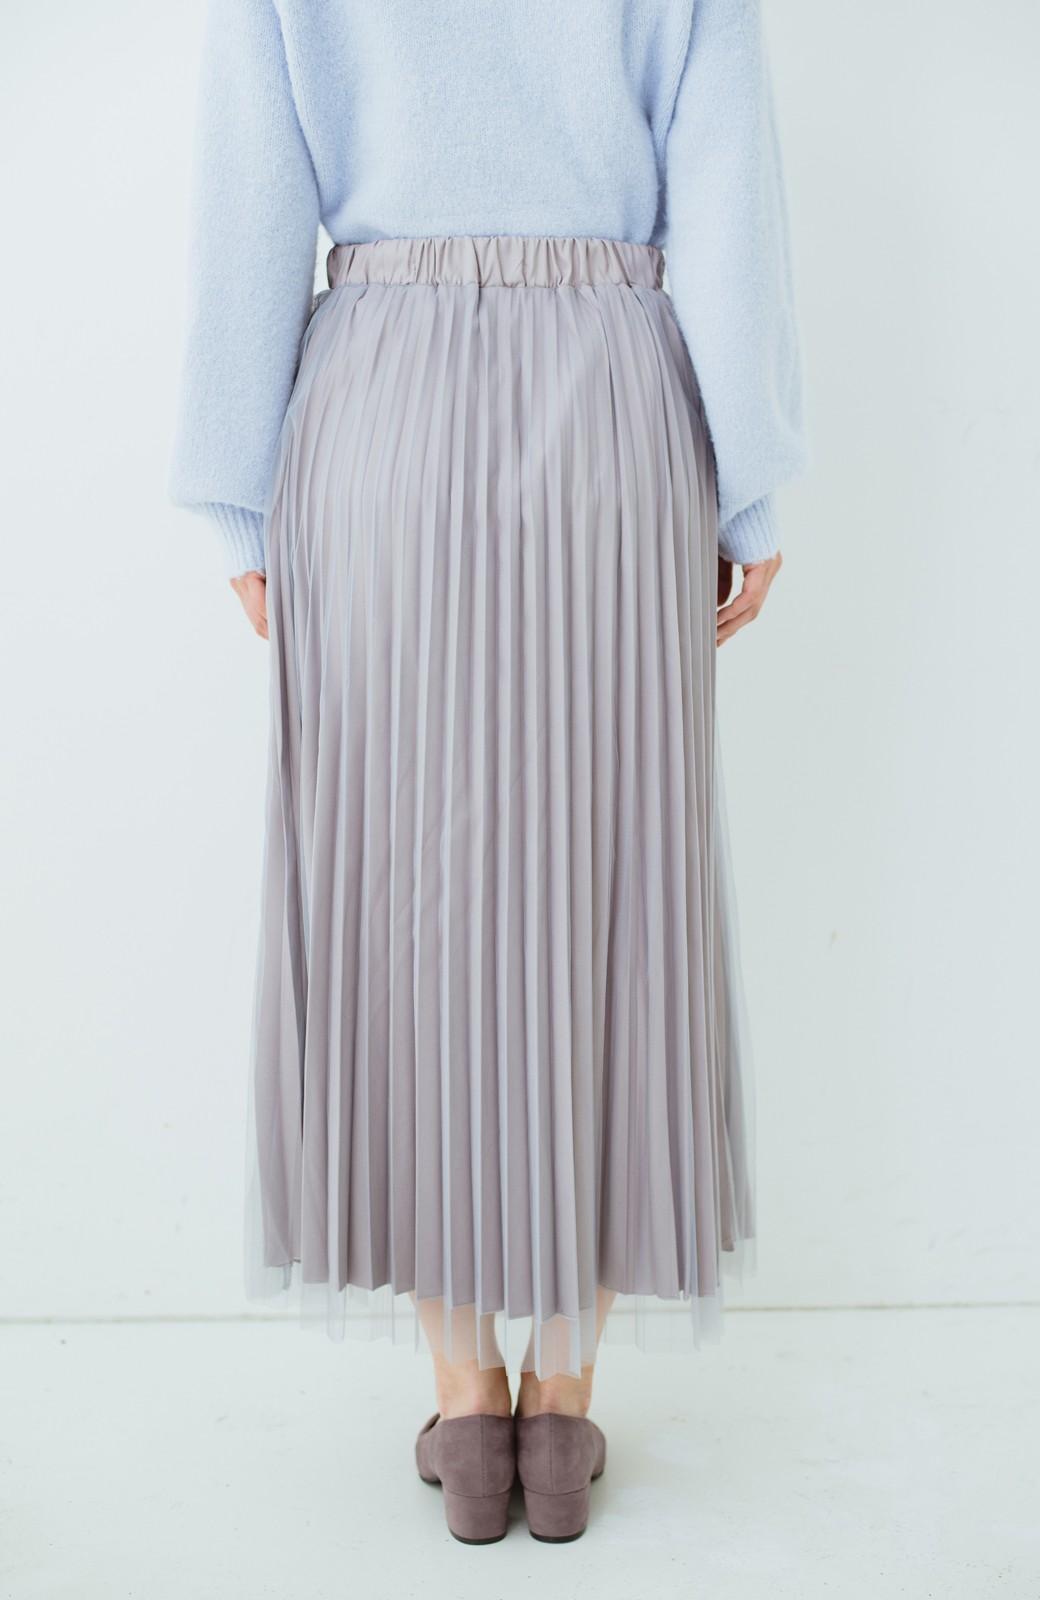 haco! どんな日も華やか気分にしてくれる 二枚仕立てのチュールプリーツスカート <ライトグレー>の商品写真6